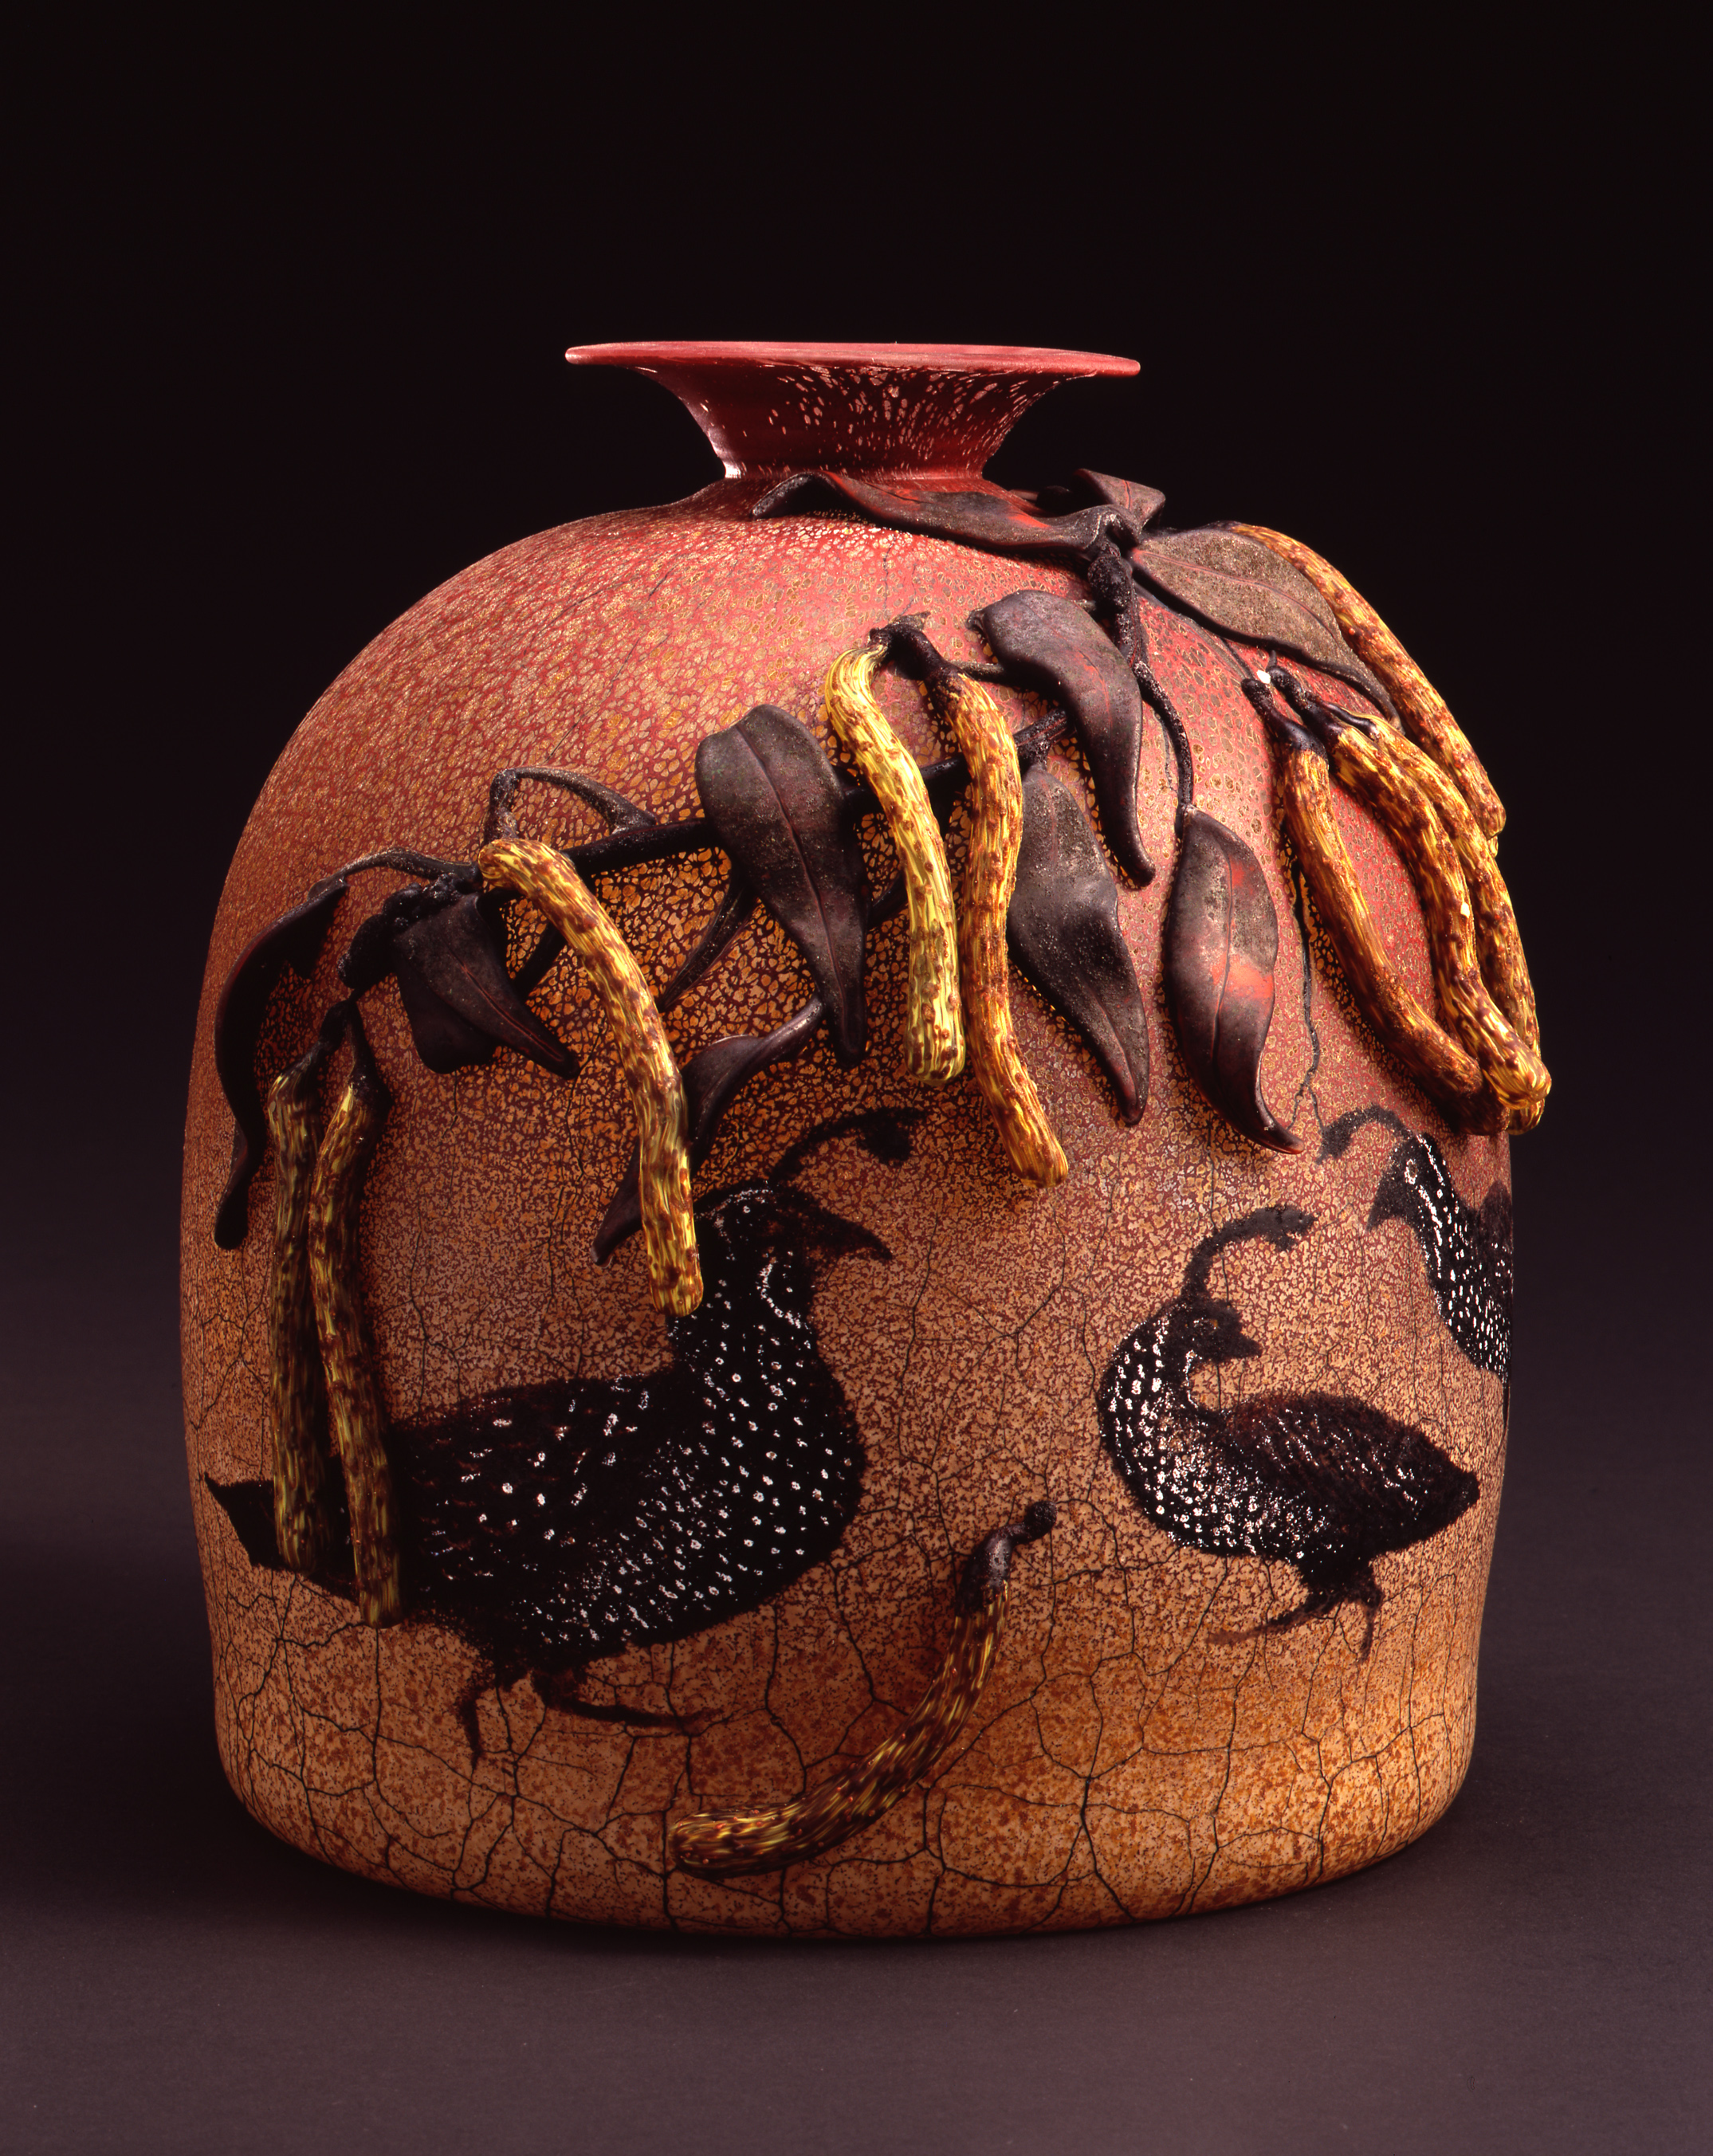 William Morris, Vessel with California Quail and Locust Pods   (2004, glass, 10 5/8 x 10 1/2 x 9 1/2 inches), WM.38